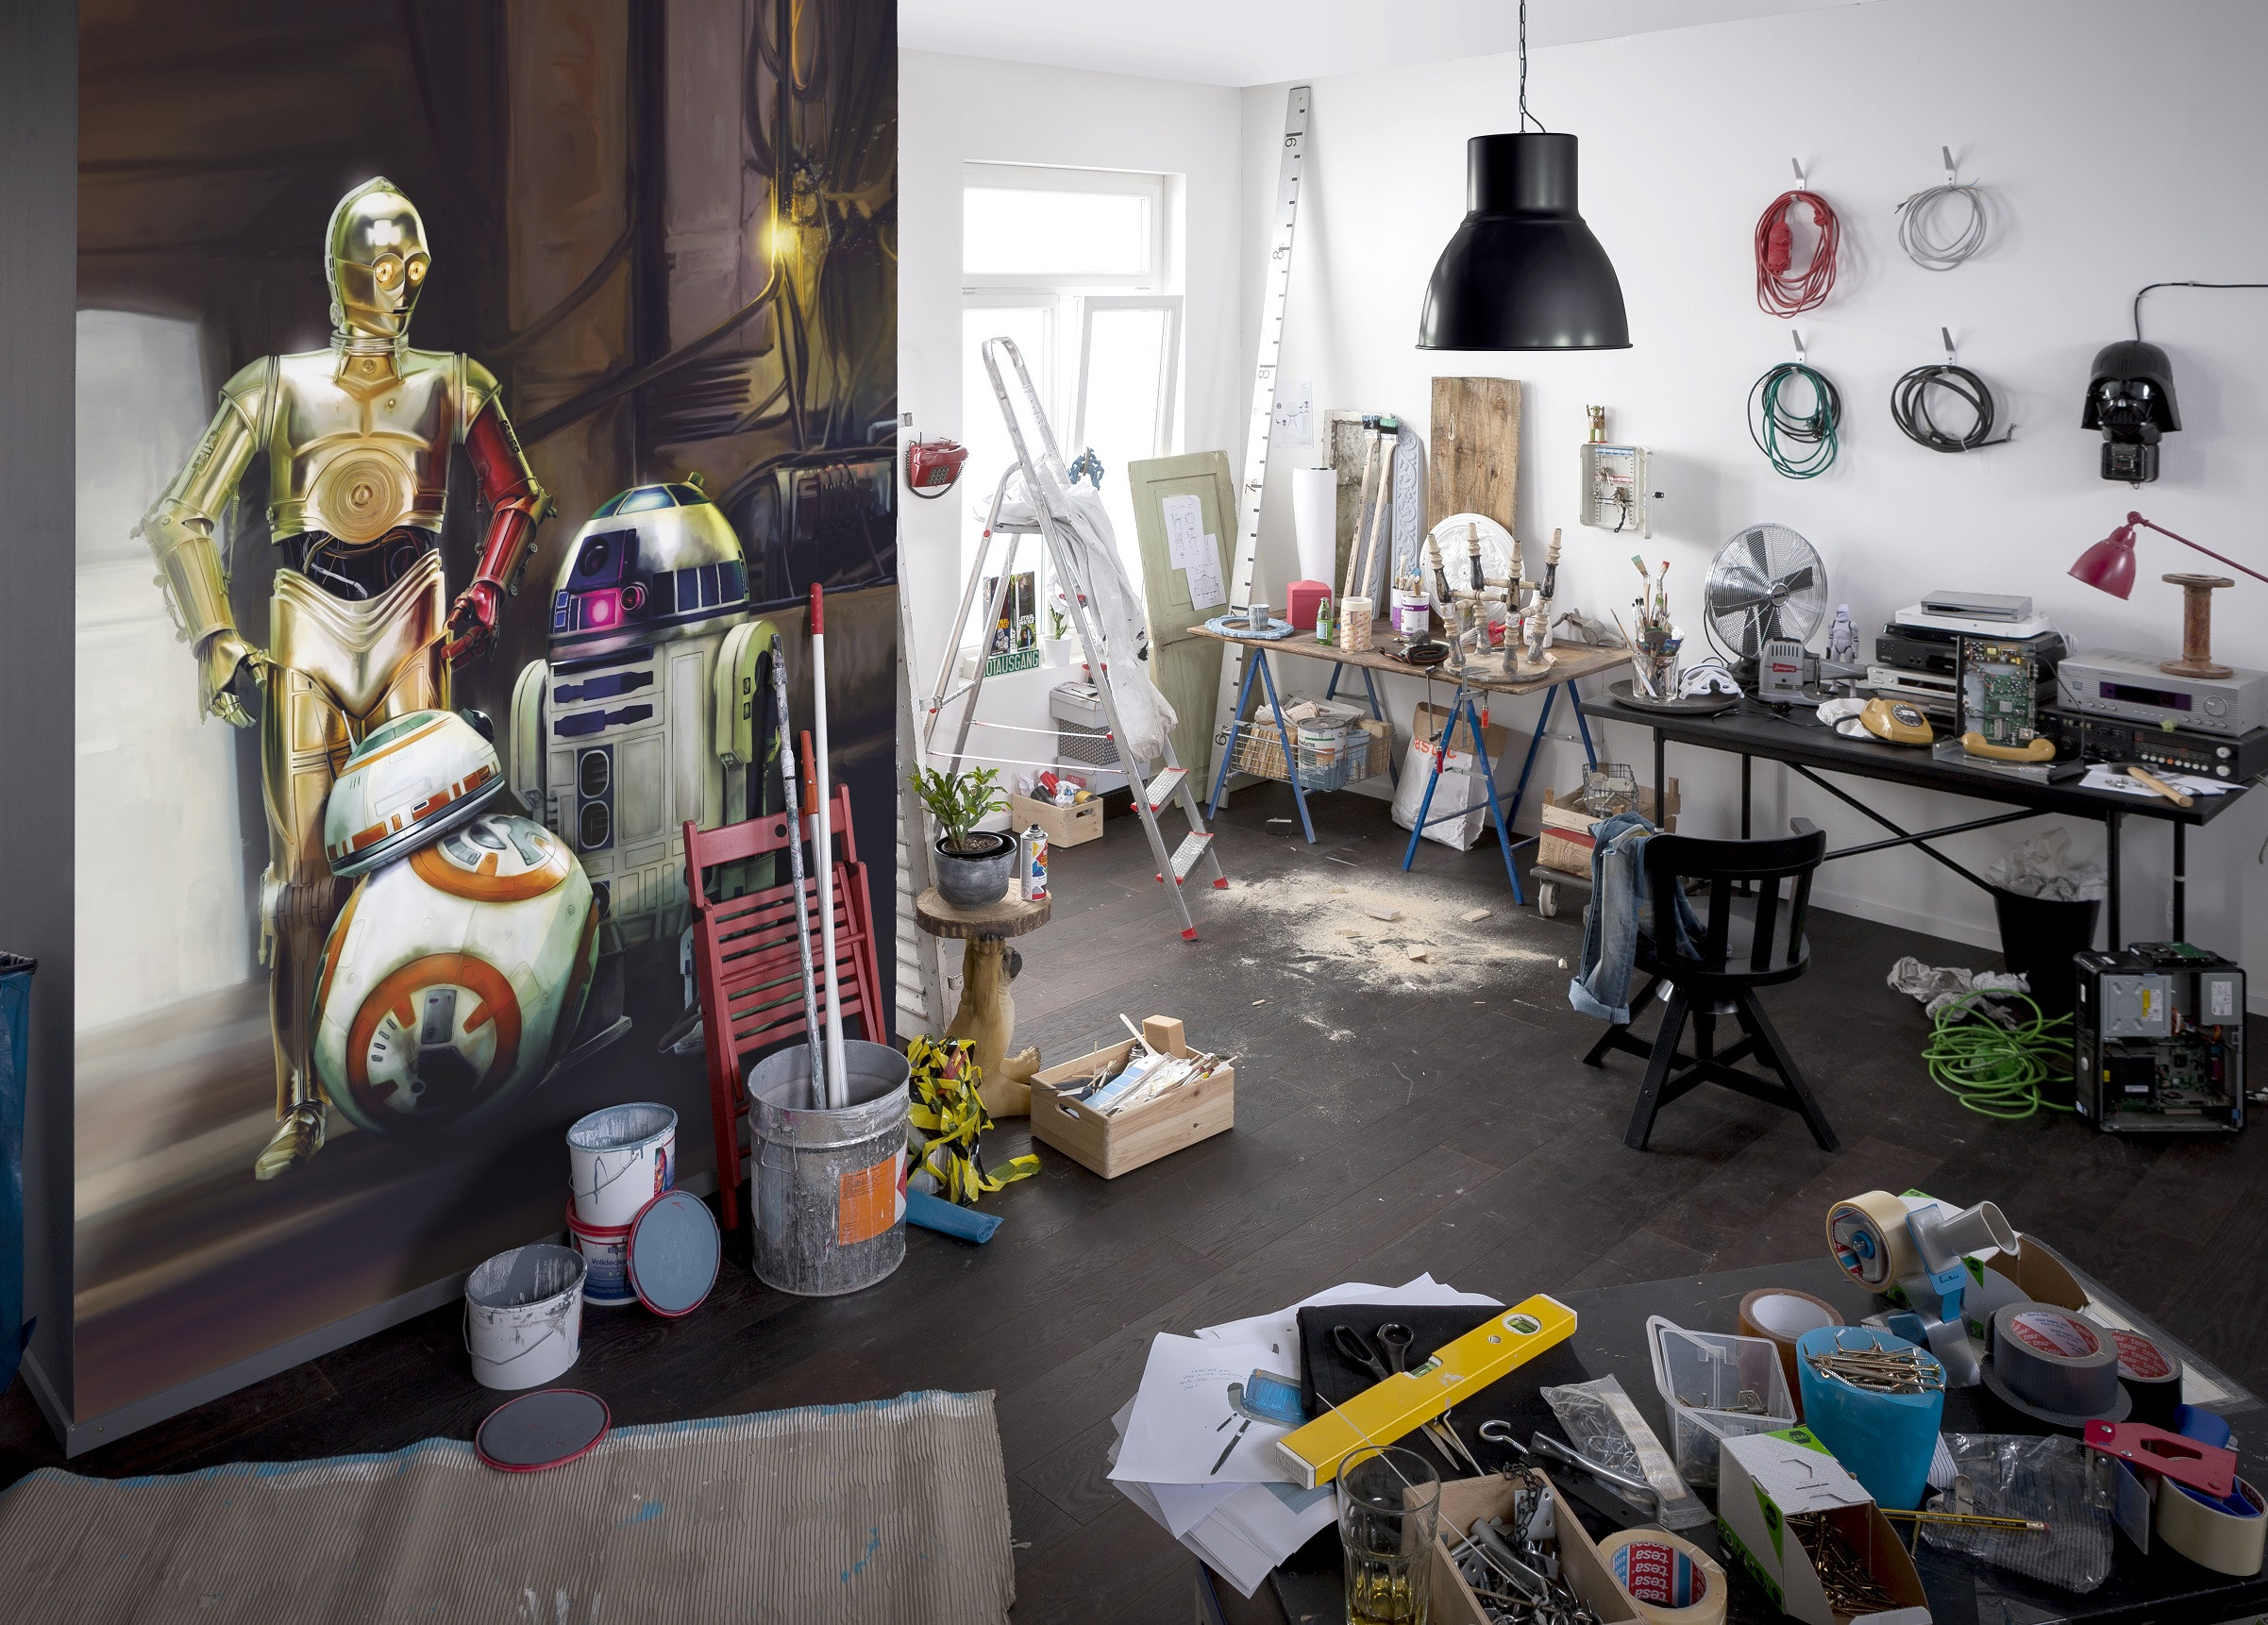 fototapete star wars three droids von komar disney star wars. Black Bedroom Furniture Sets. Home Design Ideas